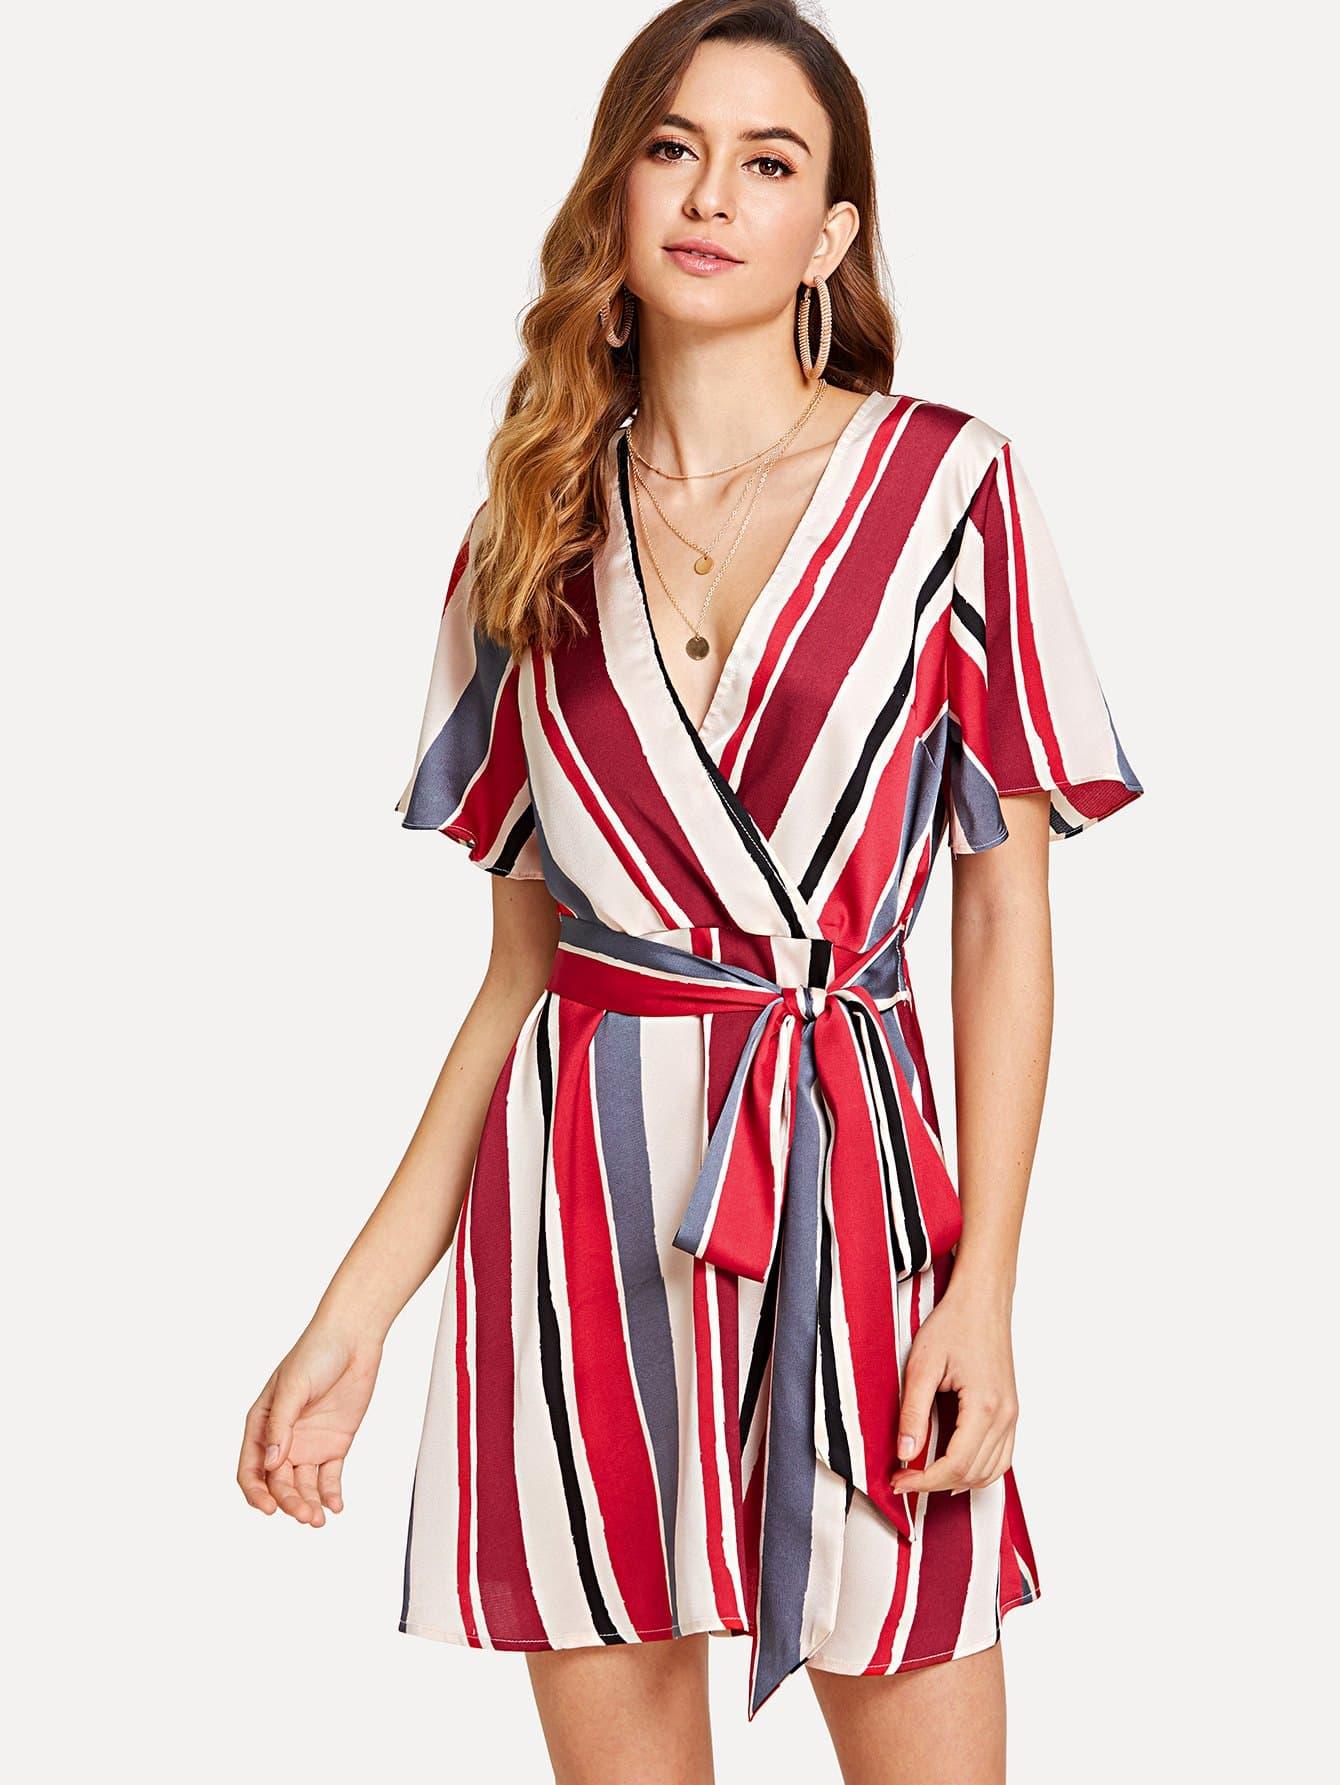 Self Belted Striped Surplice Wrap Dress surplice neck self belted floral dress